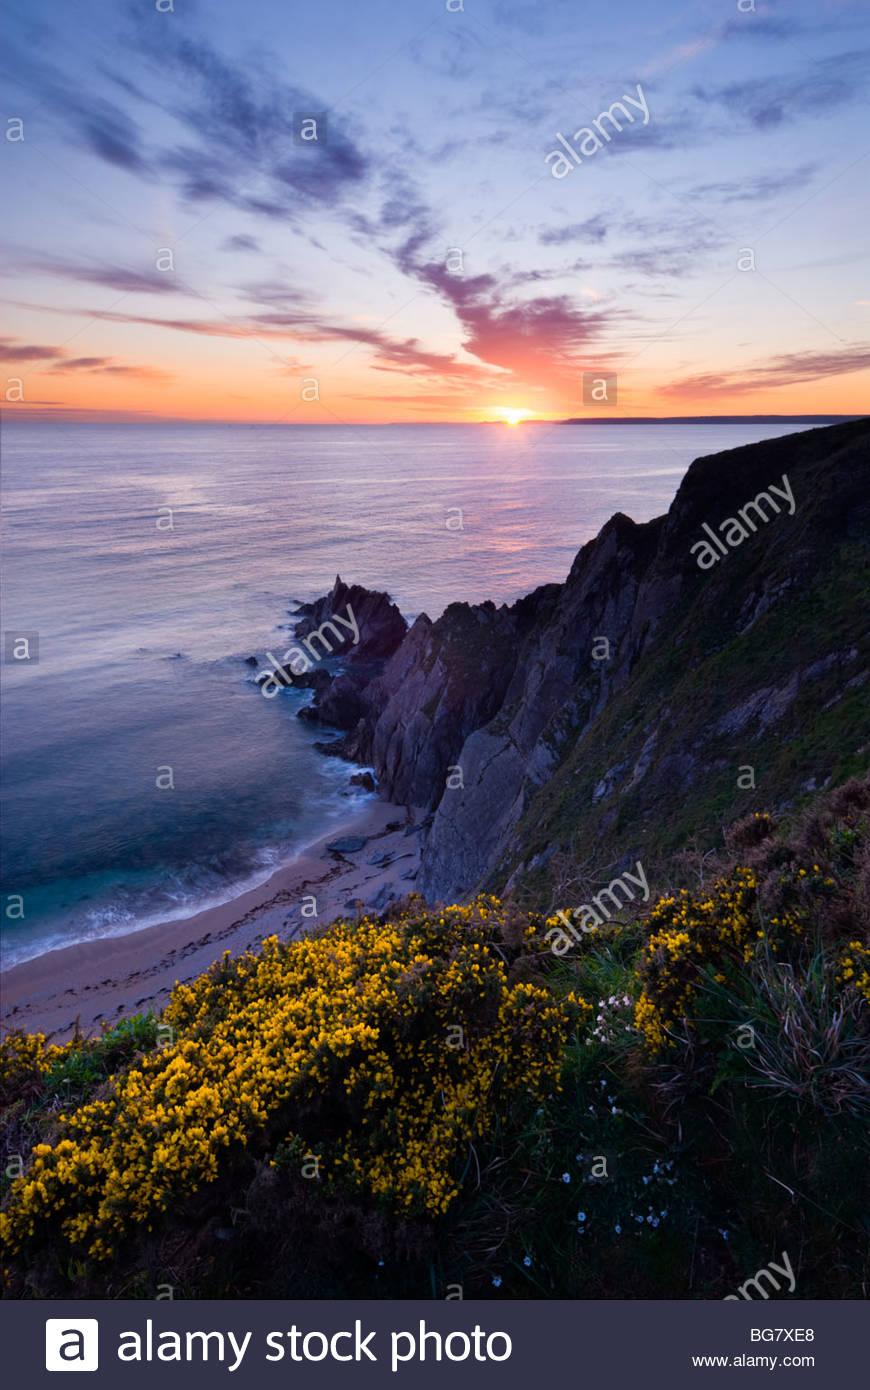 Beacon Point, in der Nähe von Hope Cove, South Hams, South Devon, England. Stockbild